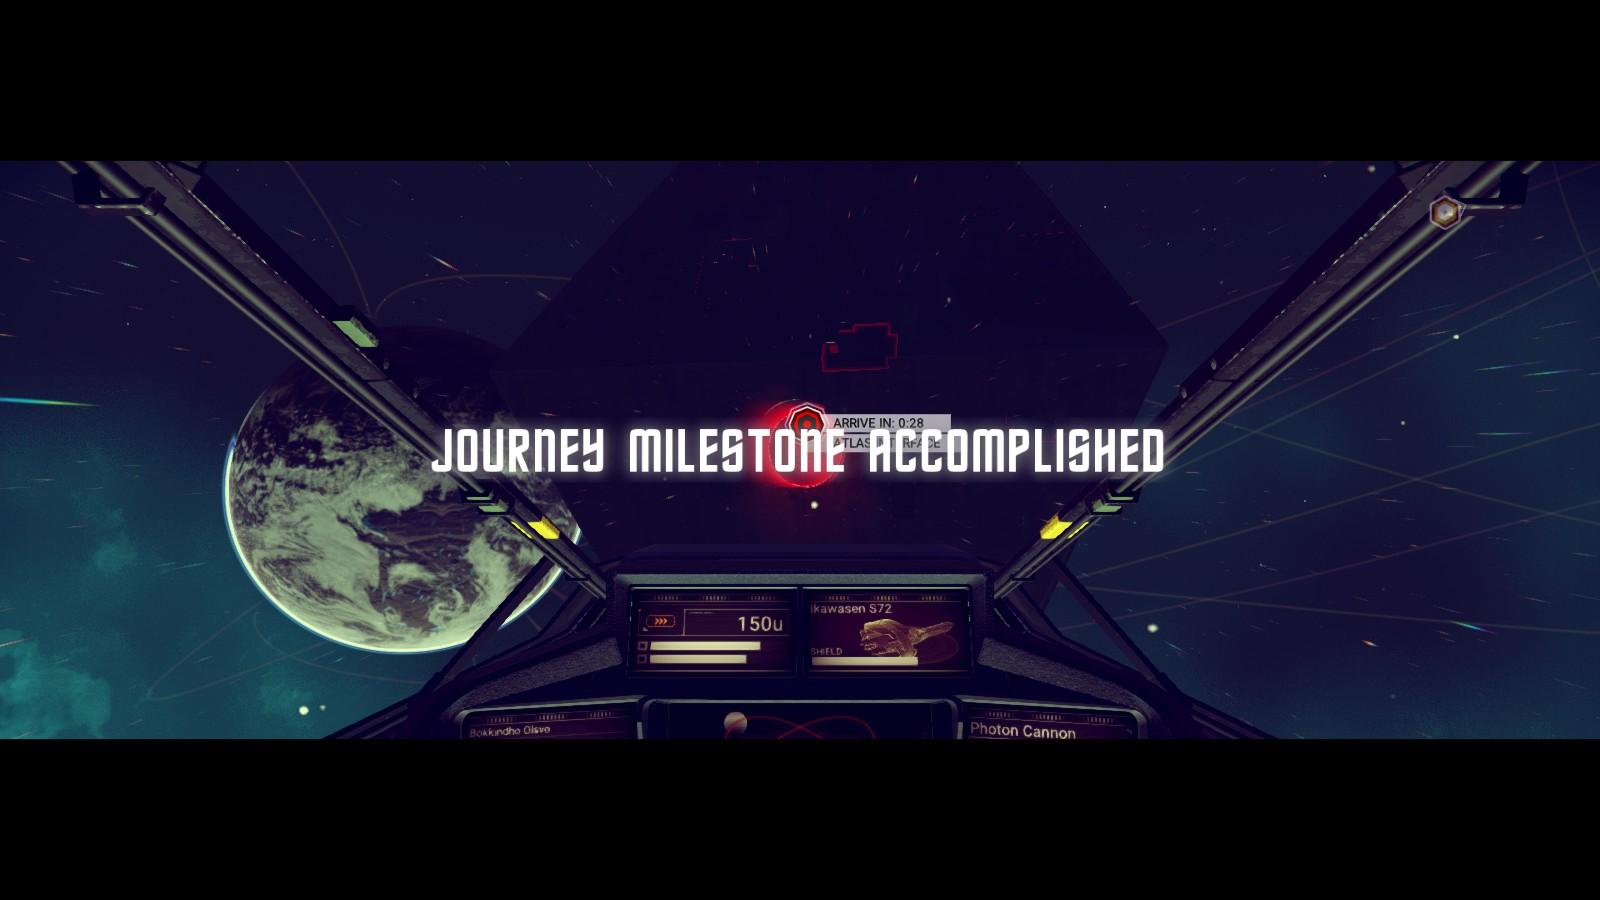 NMS – Star Trek Font replacer